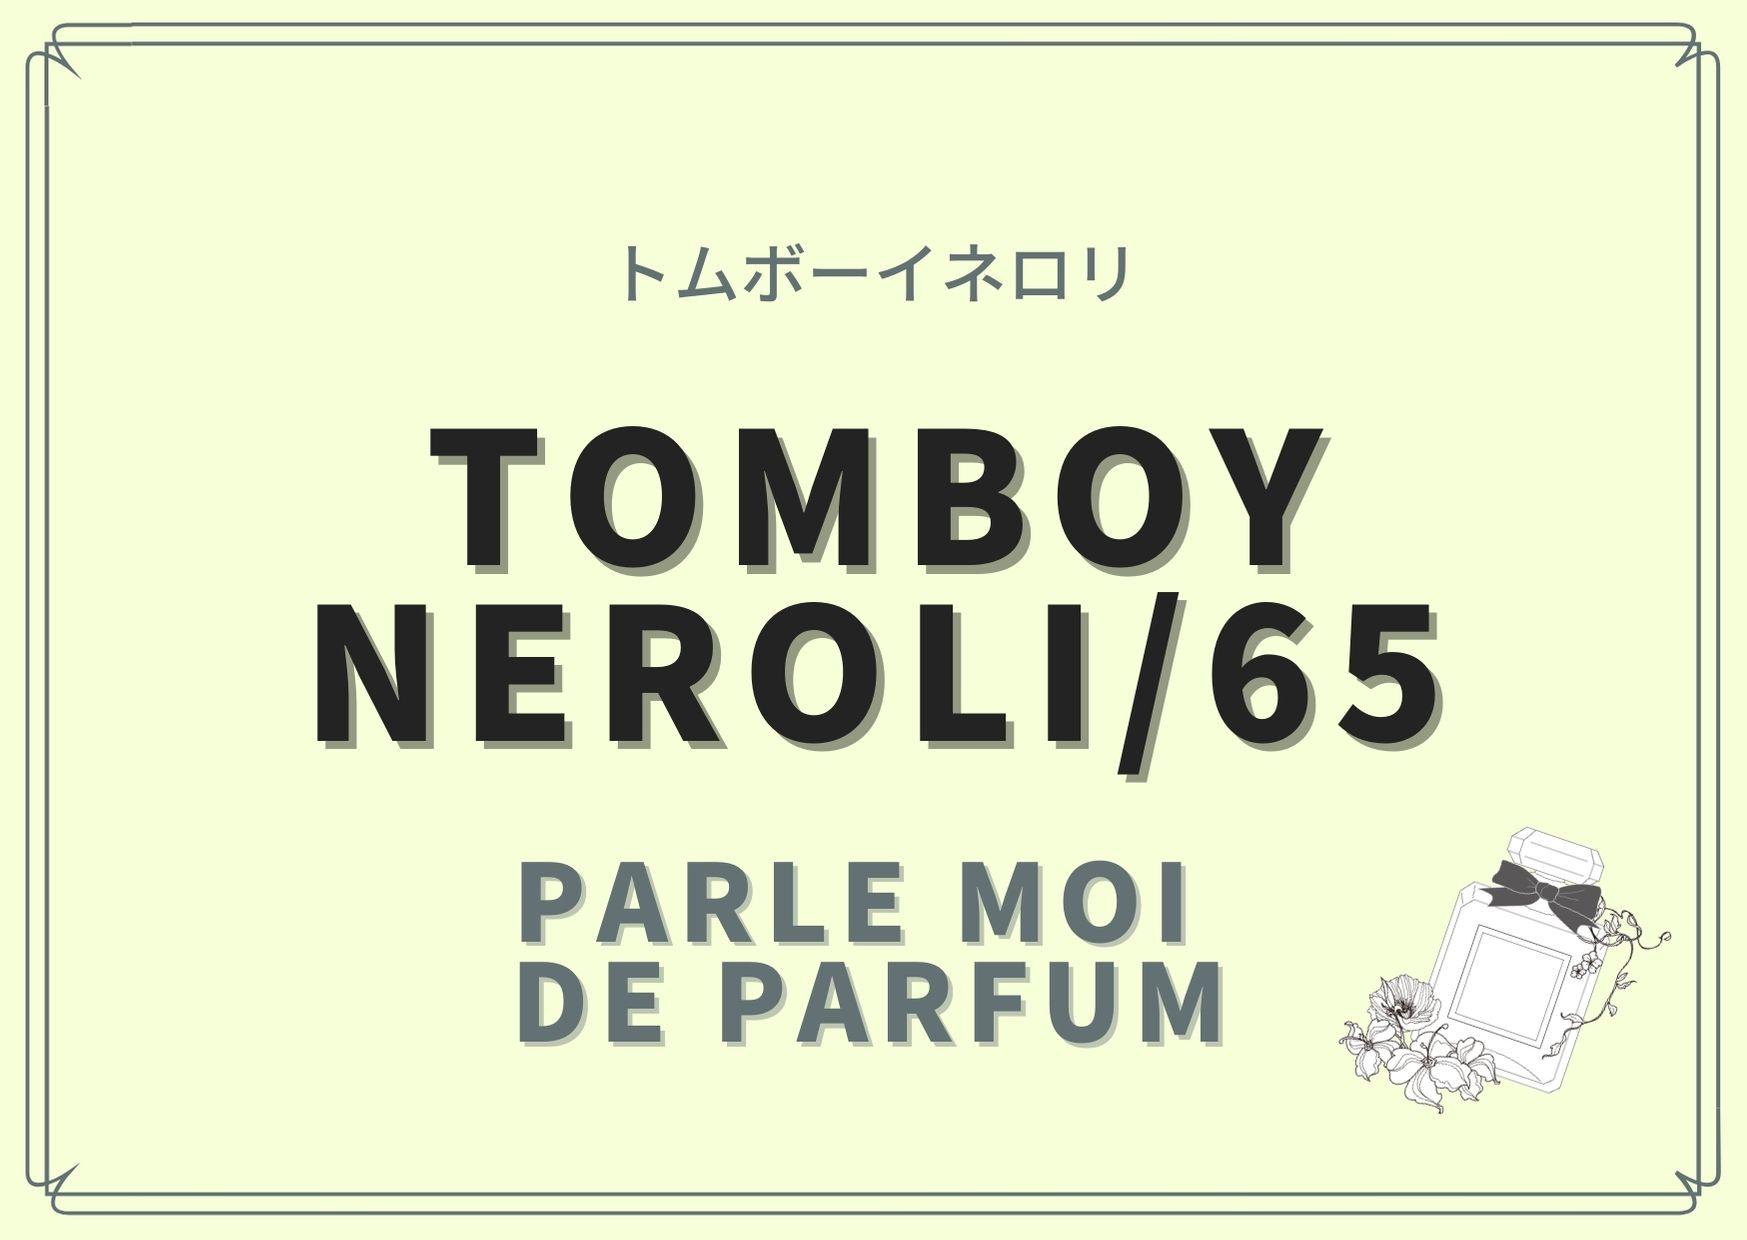 TOMBOY NEROLI/65(トムボーイネロリ)/PARLE MOI DE PARFUM(パルル モア ドゥ パルファム)